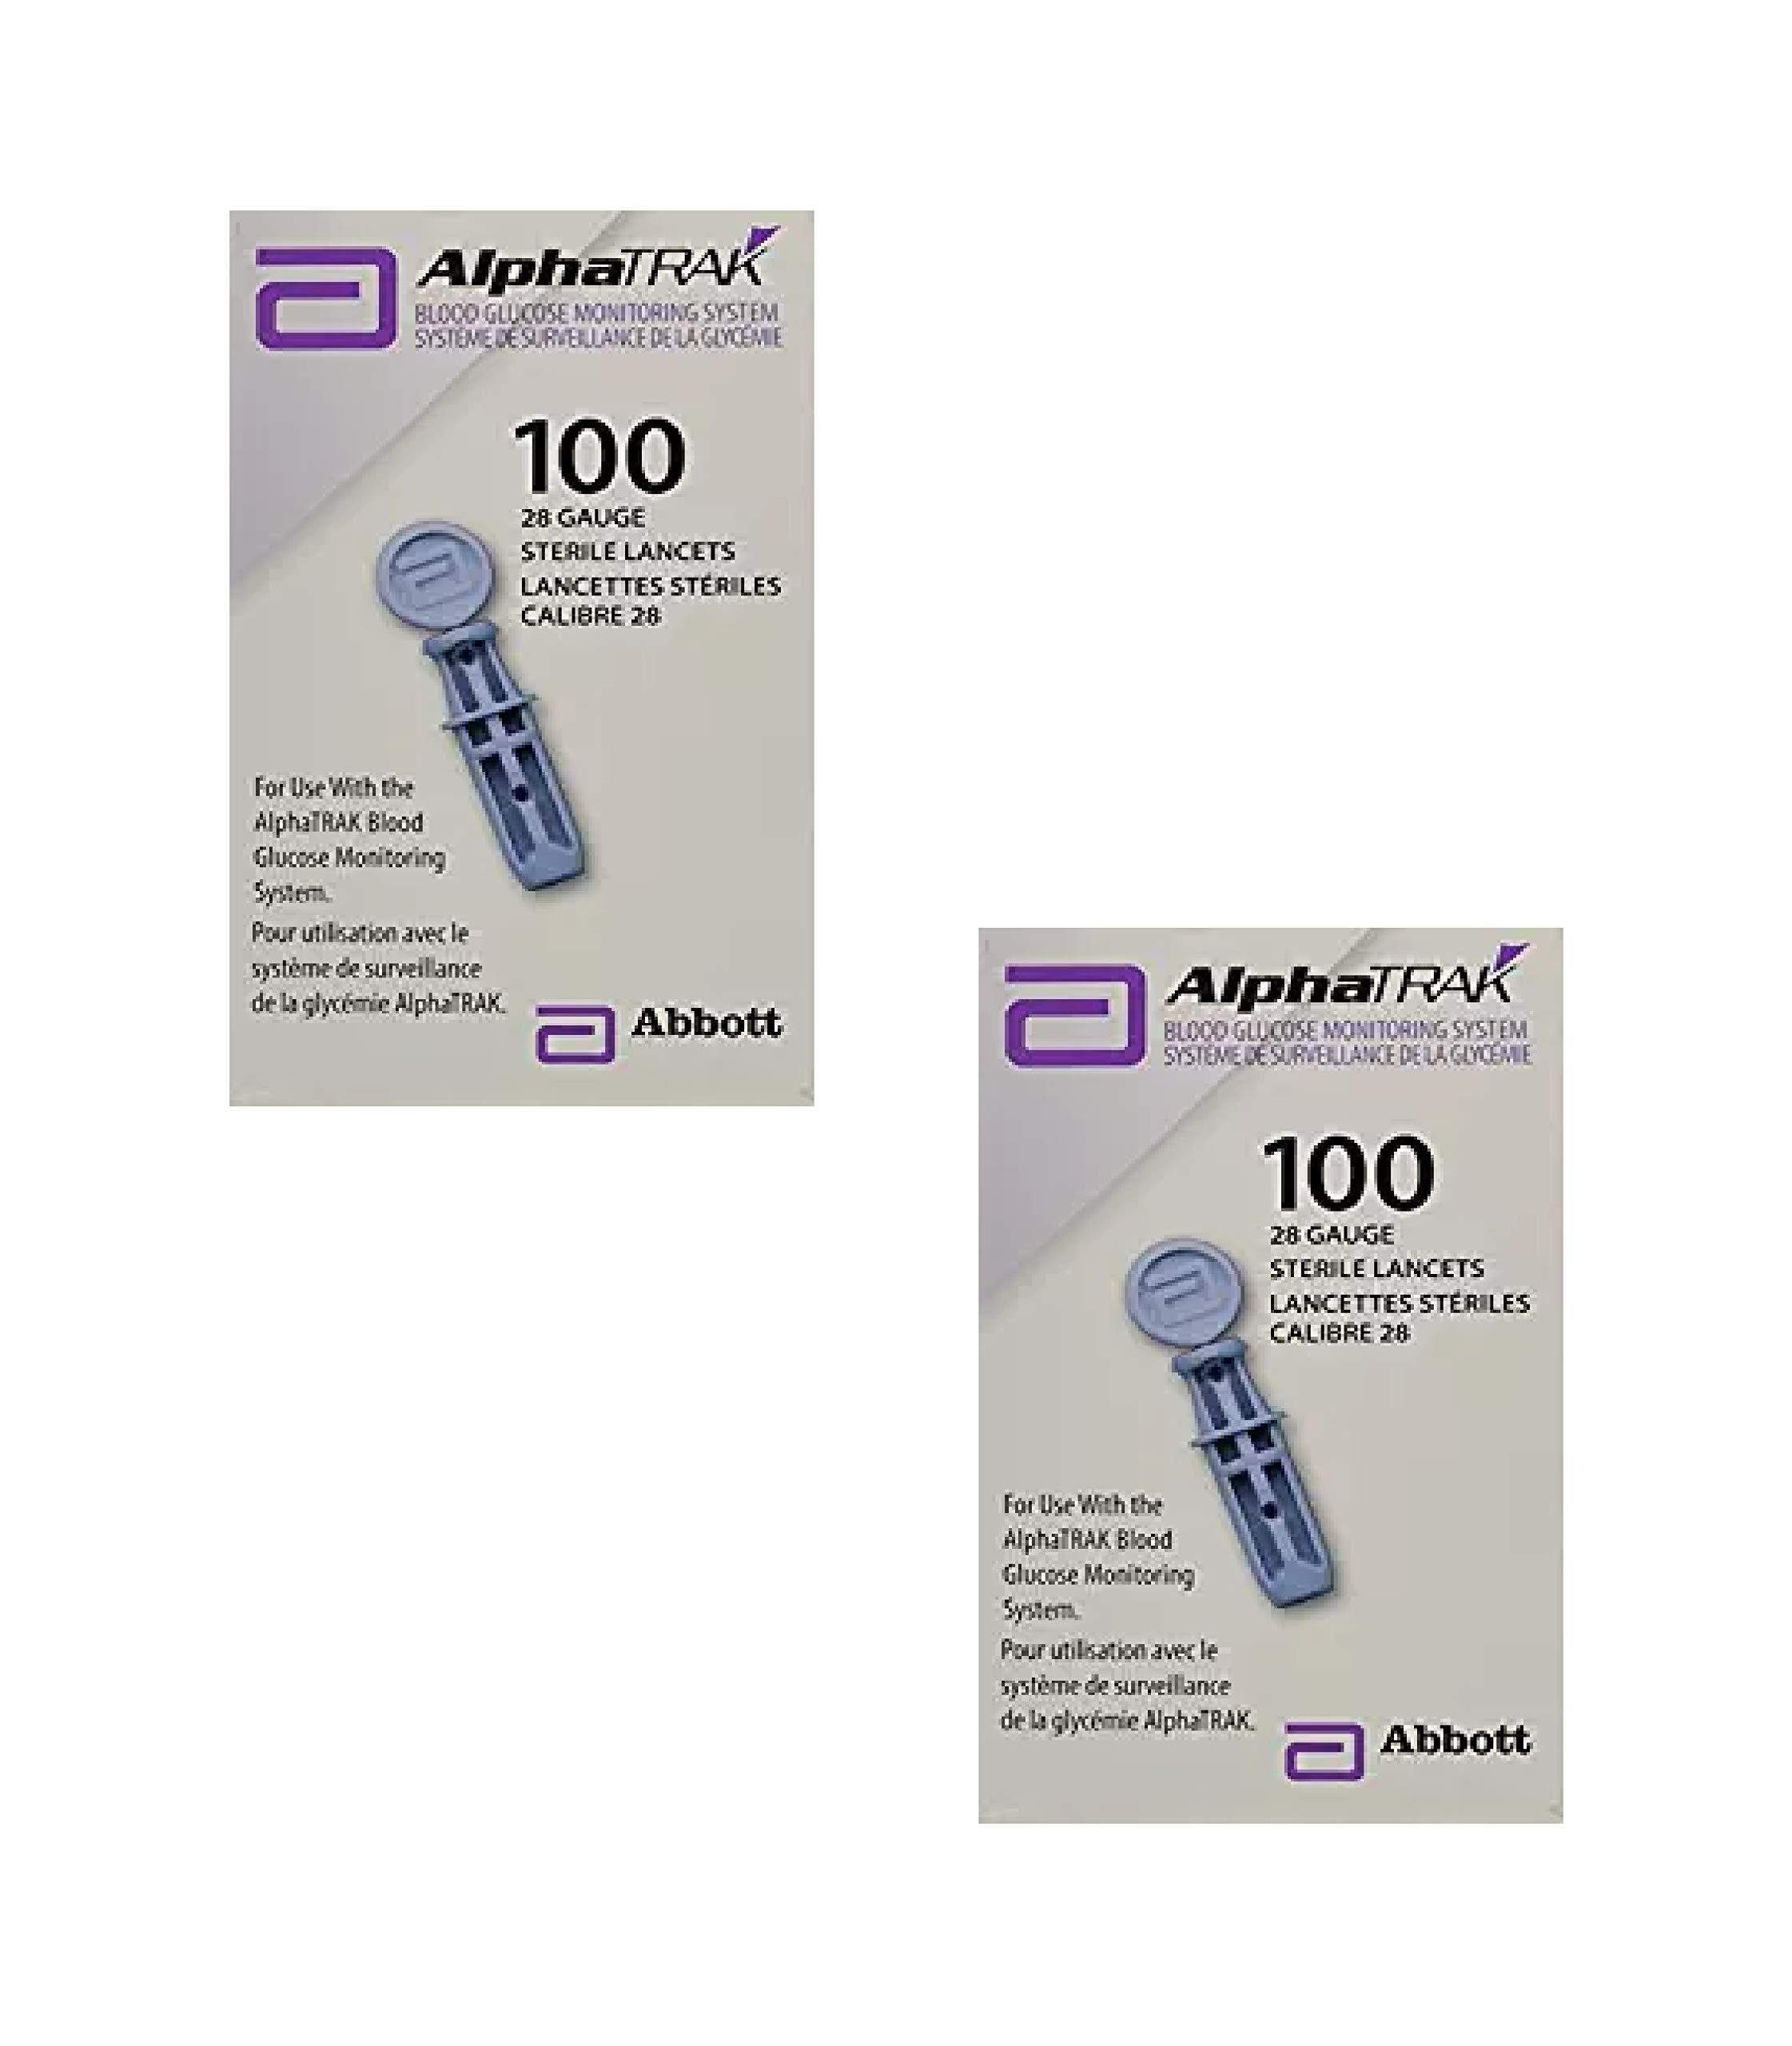 AlphaTRAK Lancets 28 Gauge sterile, 100 Count (2 Pack)